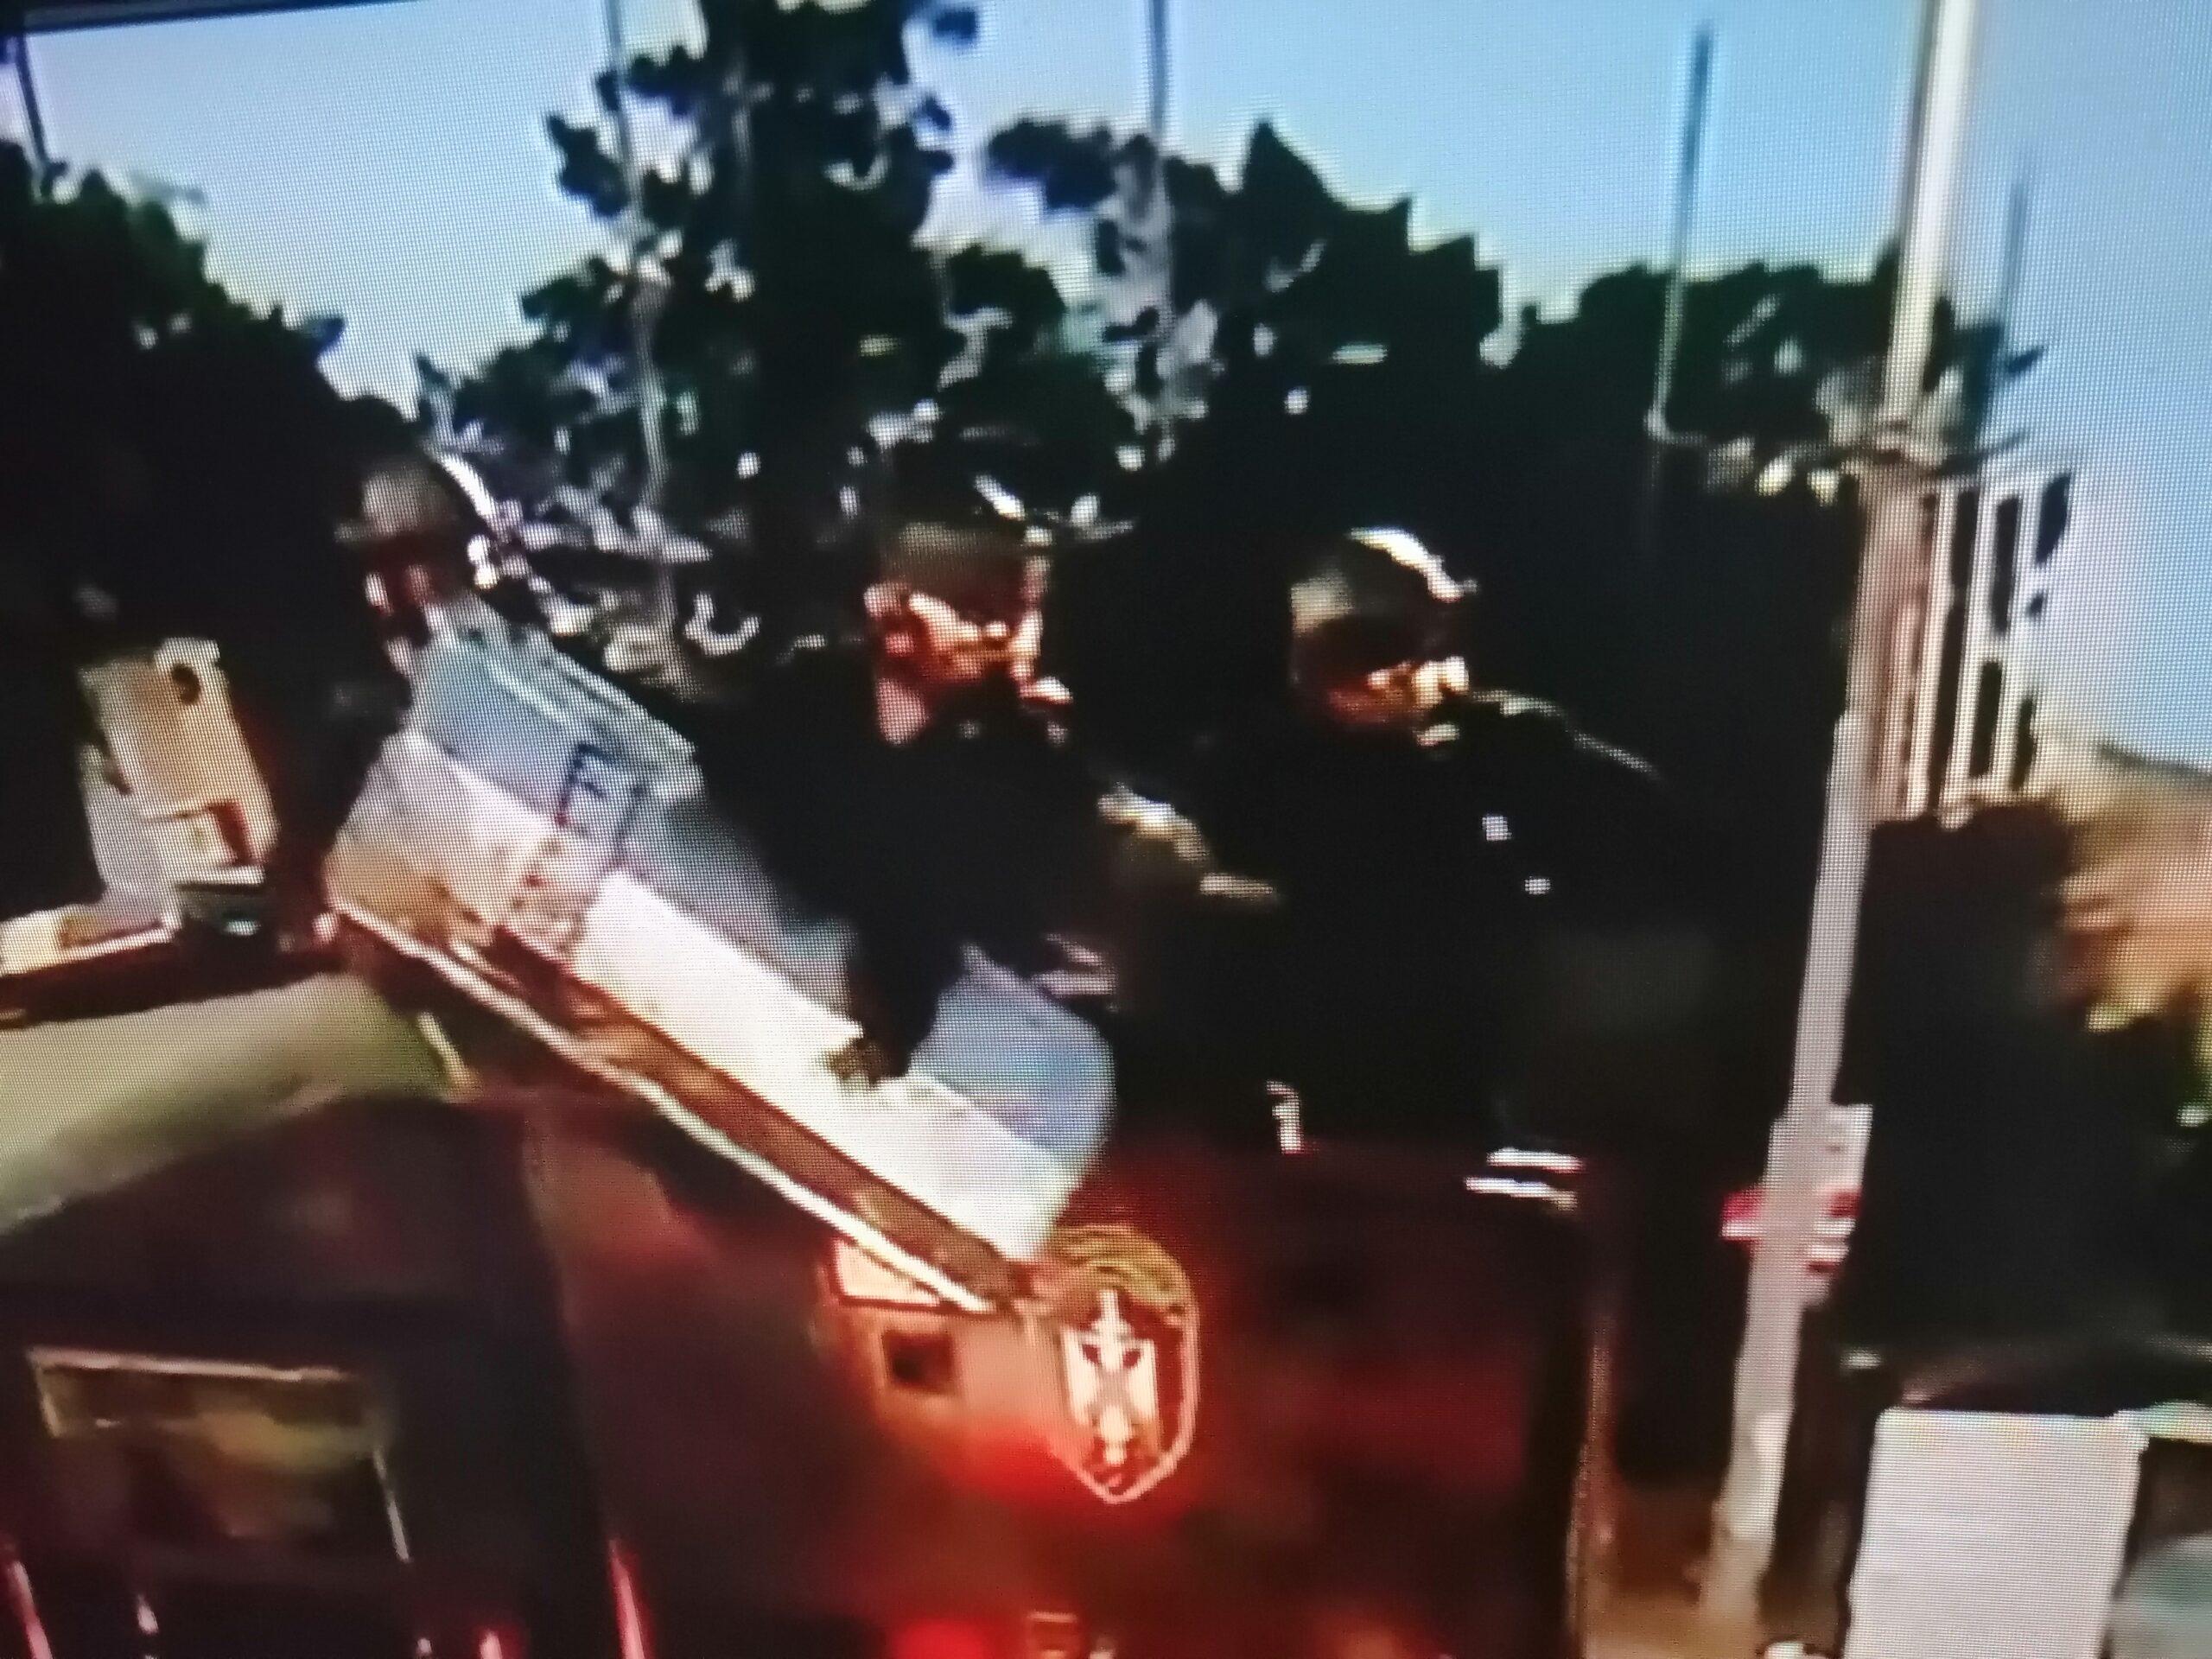 Ponovo haos ispred Skupštine, napadnuta policija, demonstranti potisnuti 38458